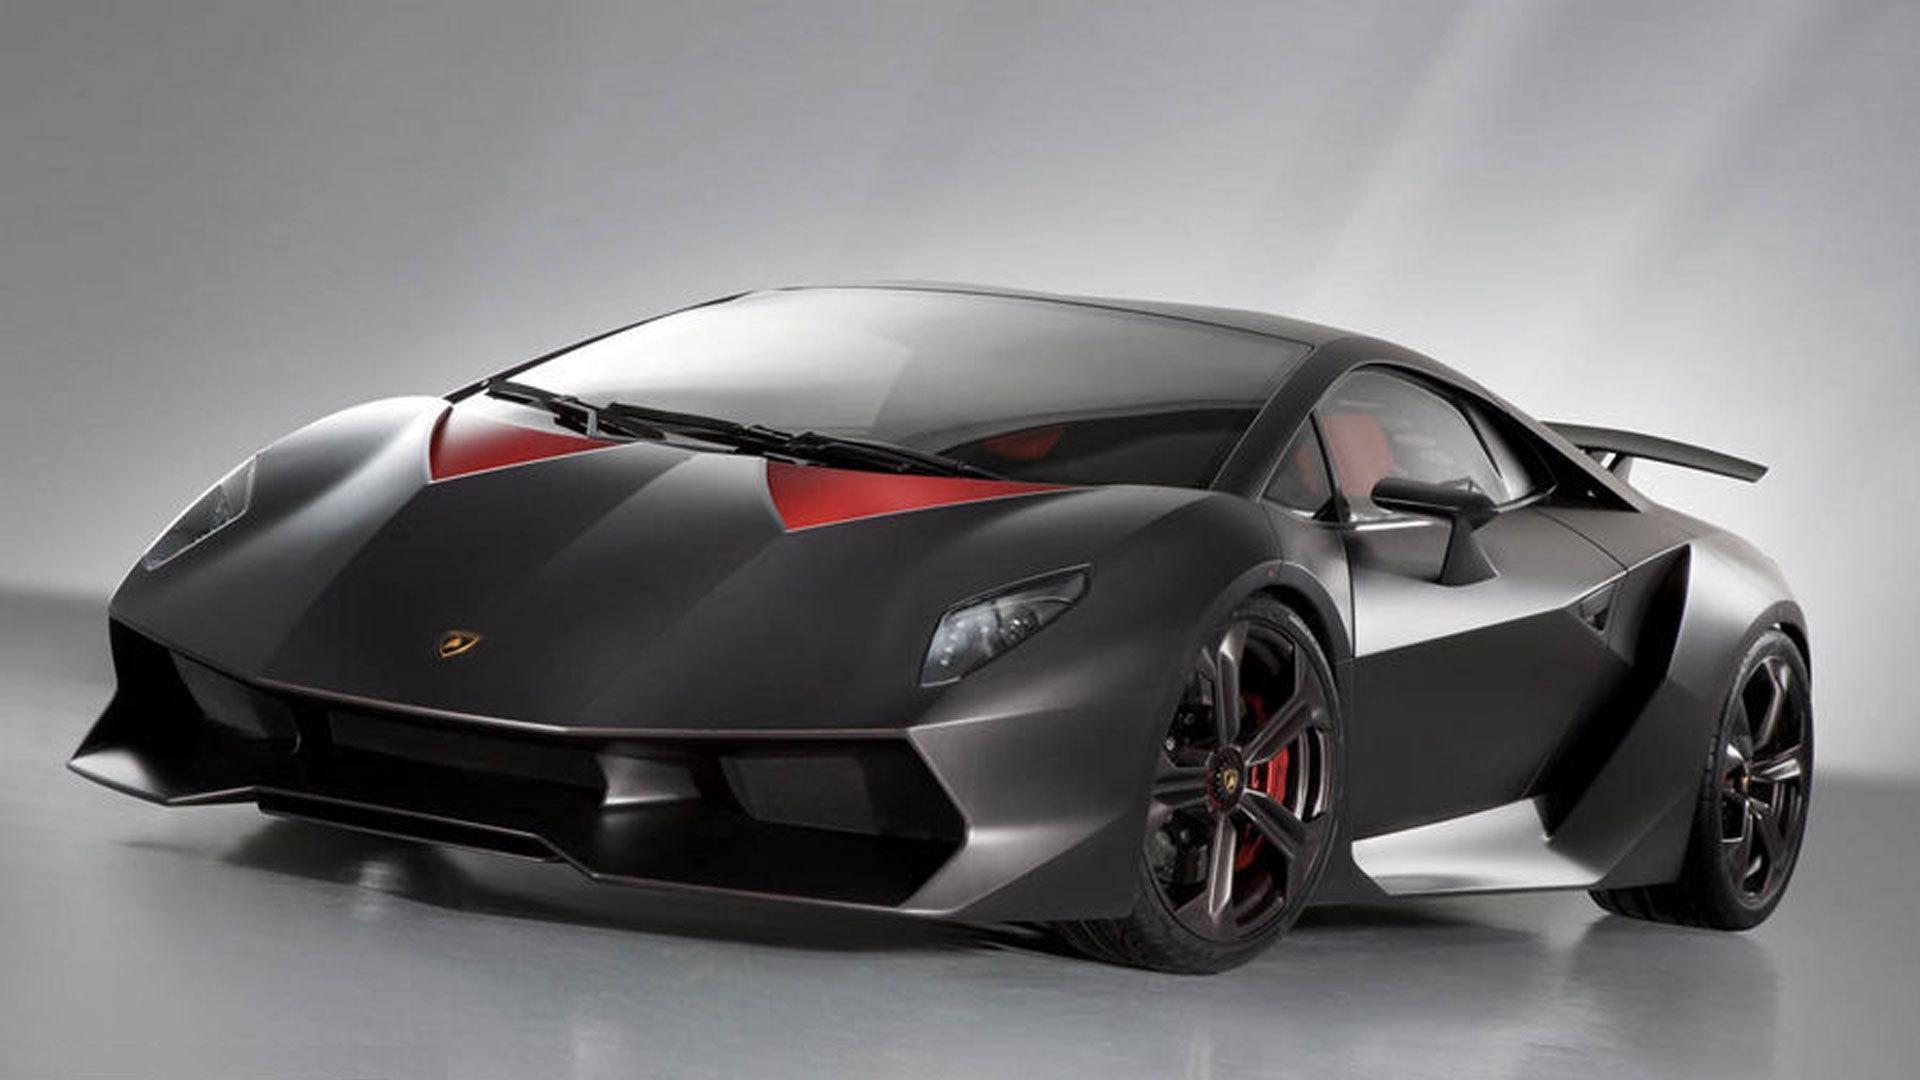 Image - Lamborghini-sesto-elemento-6.jpg | Autopedia | FANDOM ... on chevrolet camaro rims, lamborghini aventador rims, audi s5 rims, lexus lfa rims, aston martin rims, lamborghini gallardo spyder rims, maserati granturismo rims, mustang rims, porsche 918 rims, bmw m3 rims, porsche cayman rims, lamborghini countach rims,